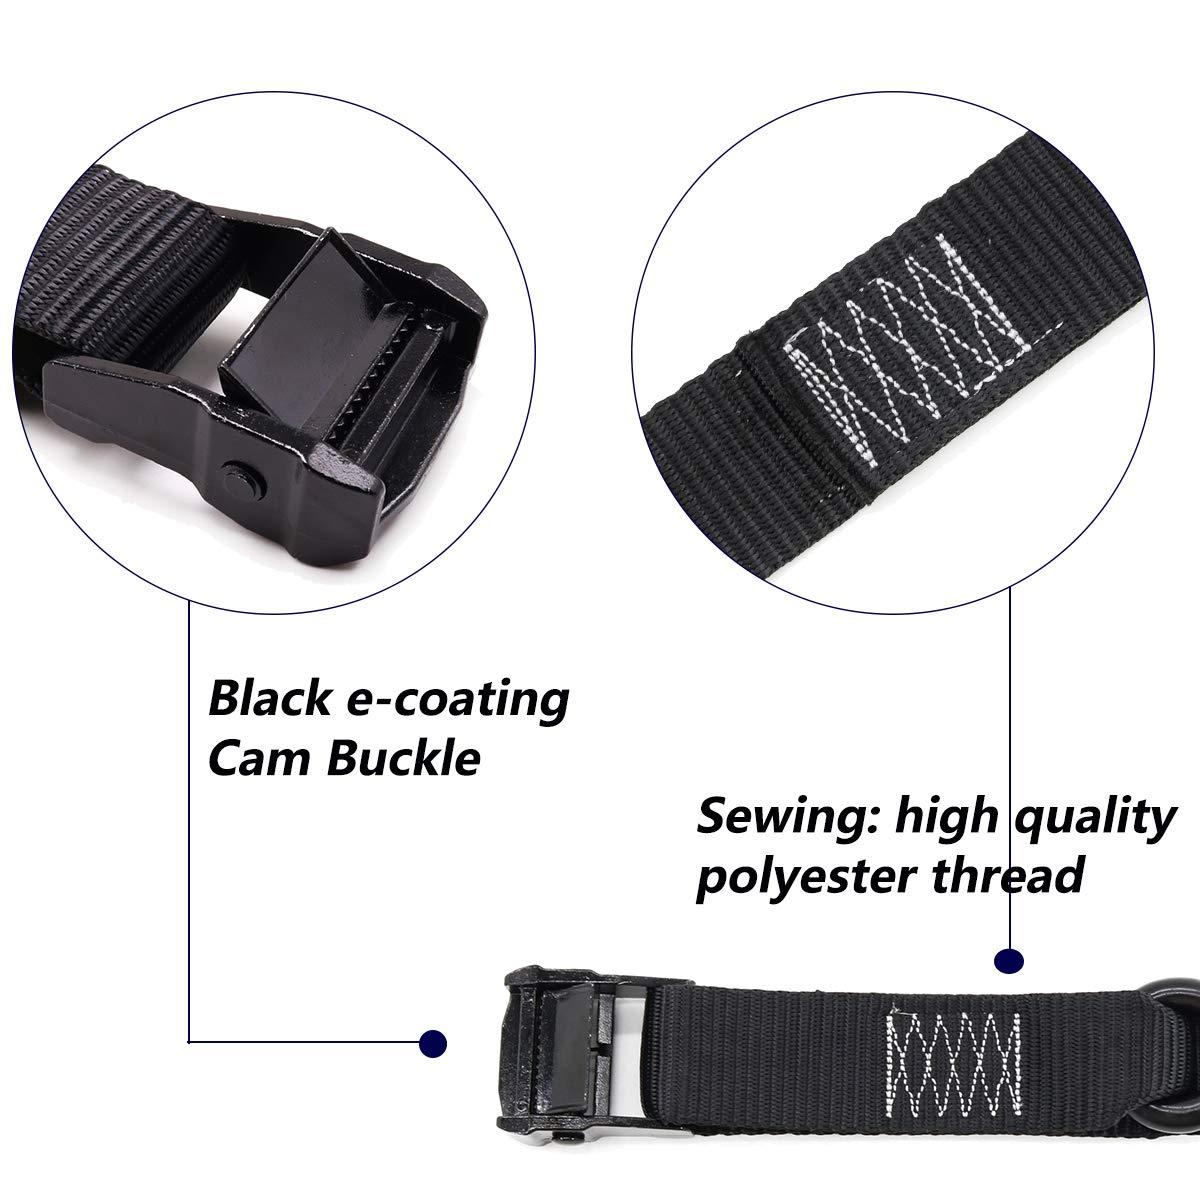 S Hooks with Keeper 1, 6.5ft ZHANGJIAGANG CITY XIANGLE TOOL CO 2pk Black E-Coating Cam Buckle Tie Down 1.5 inch-6.5ft Xiangle Lashing Straps LTD T/&HI-B07DW92WY9